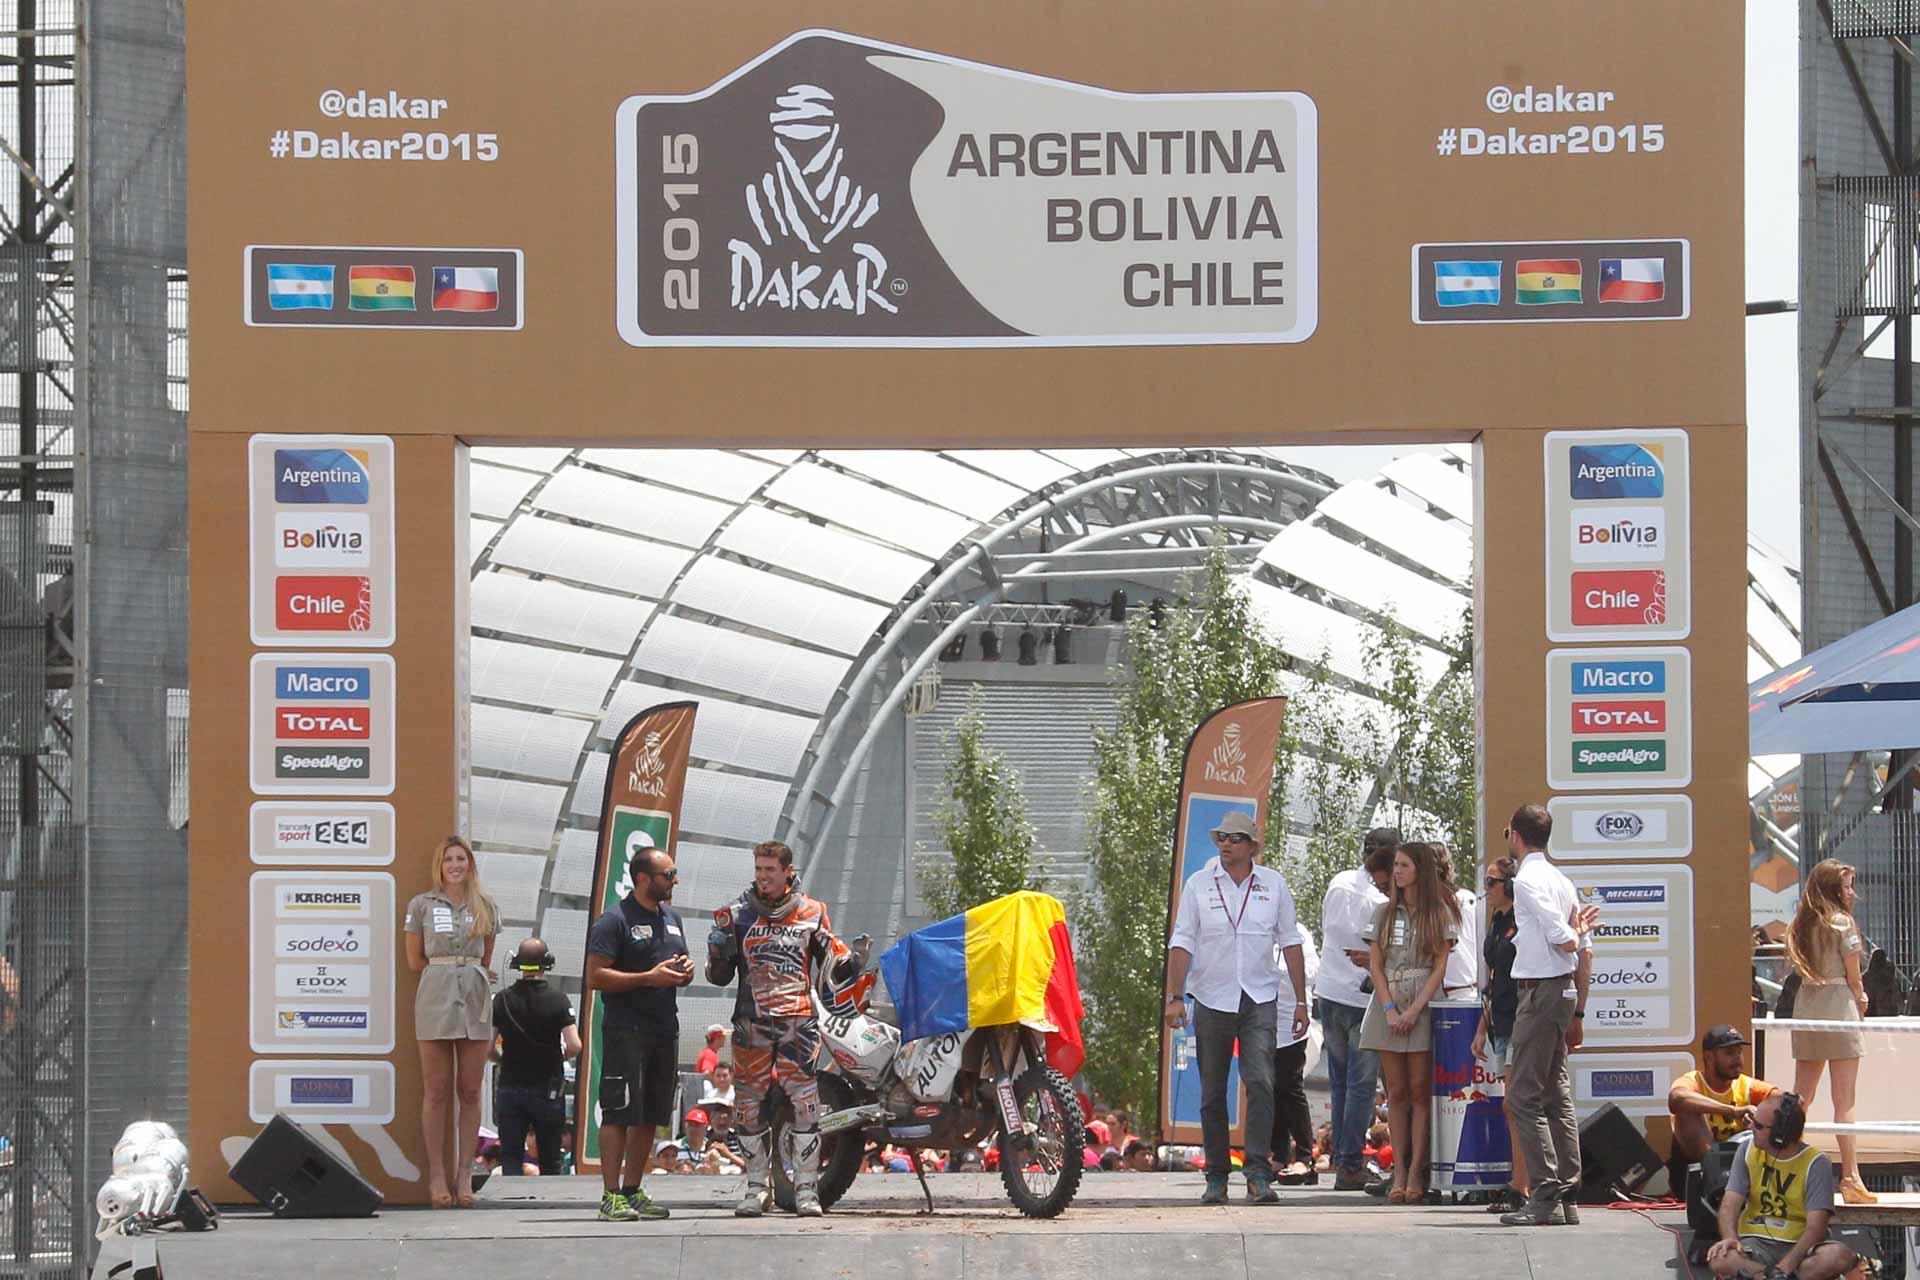 Emaneul Gyenes la al doilea titlu în Raliul Dakar